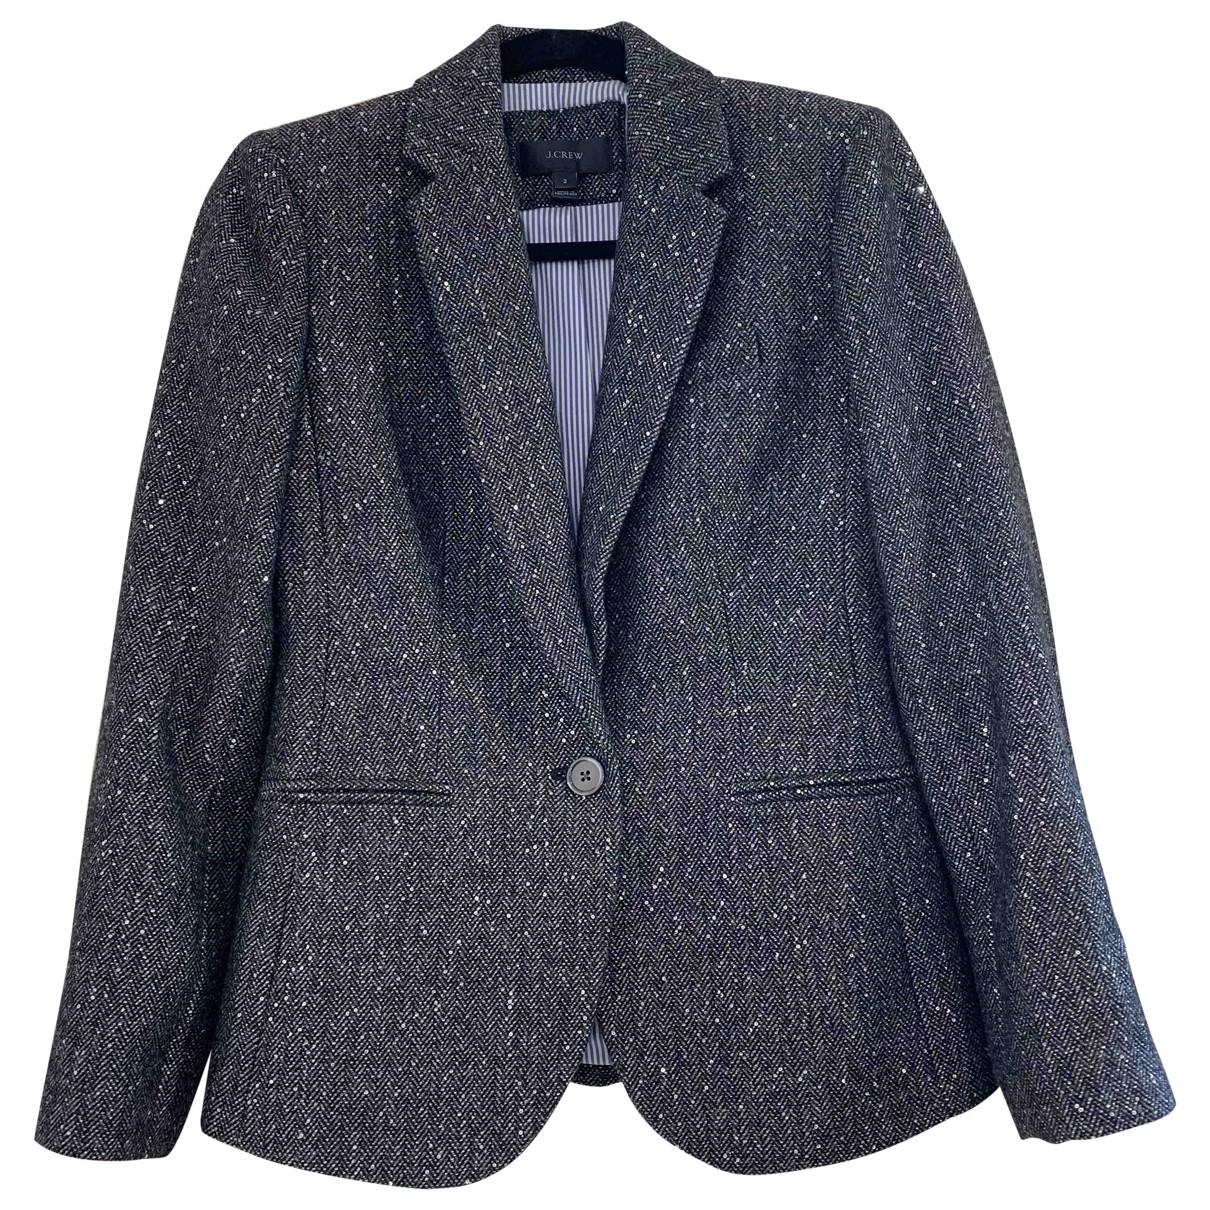 J.crew \N Grey Wool jacket for Women 2 0-5